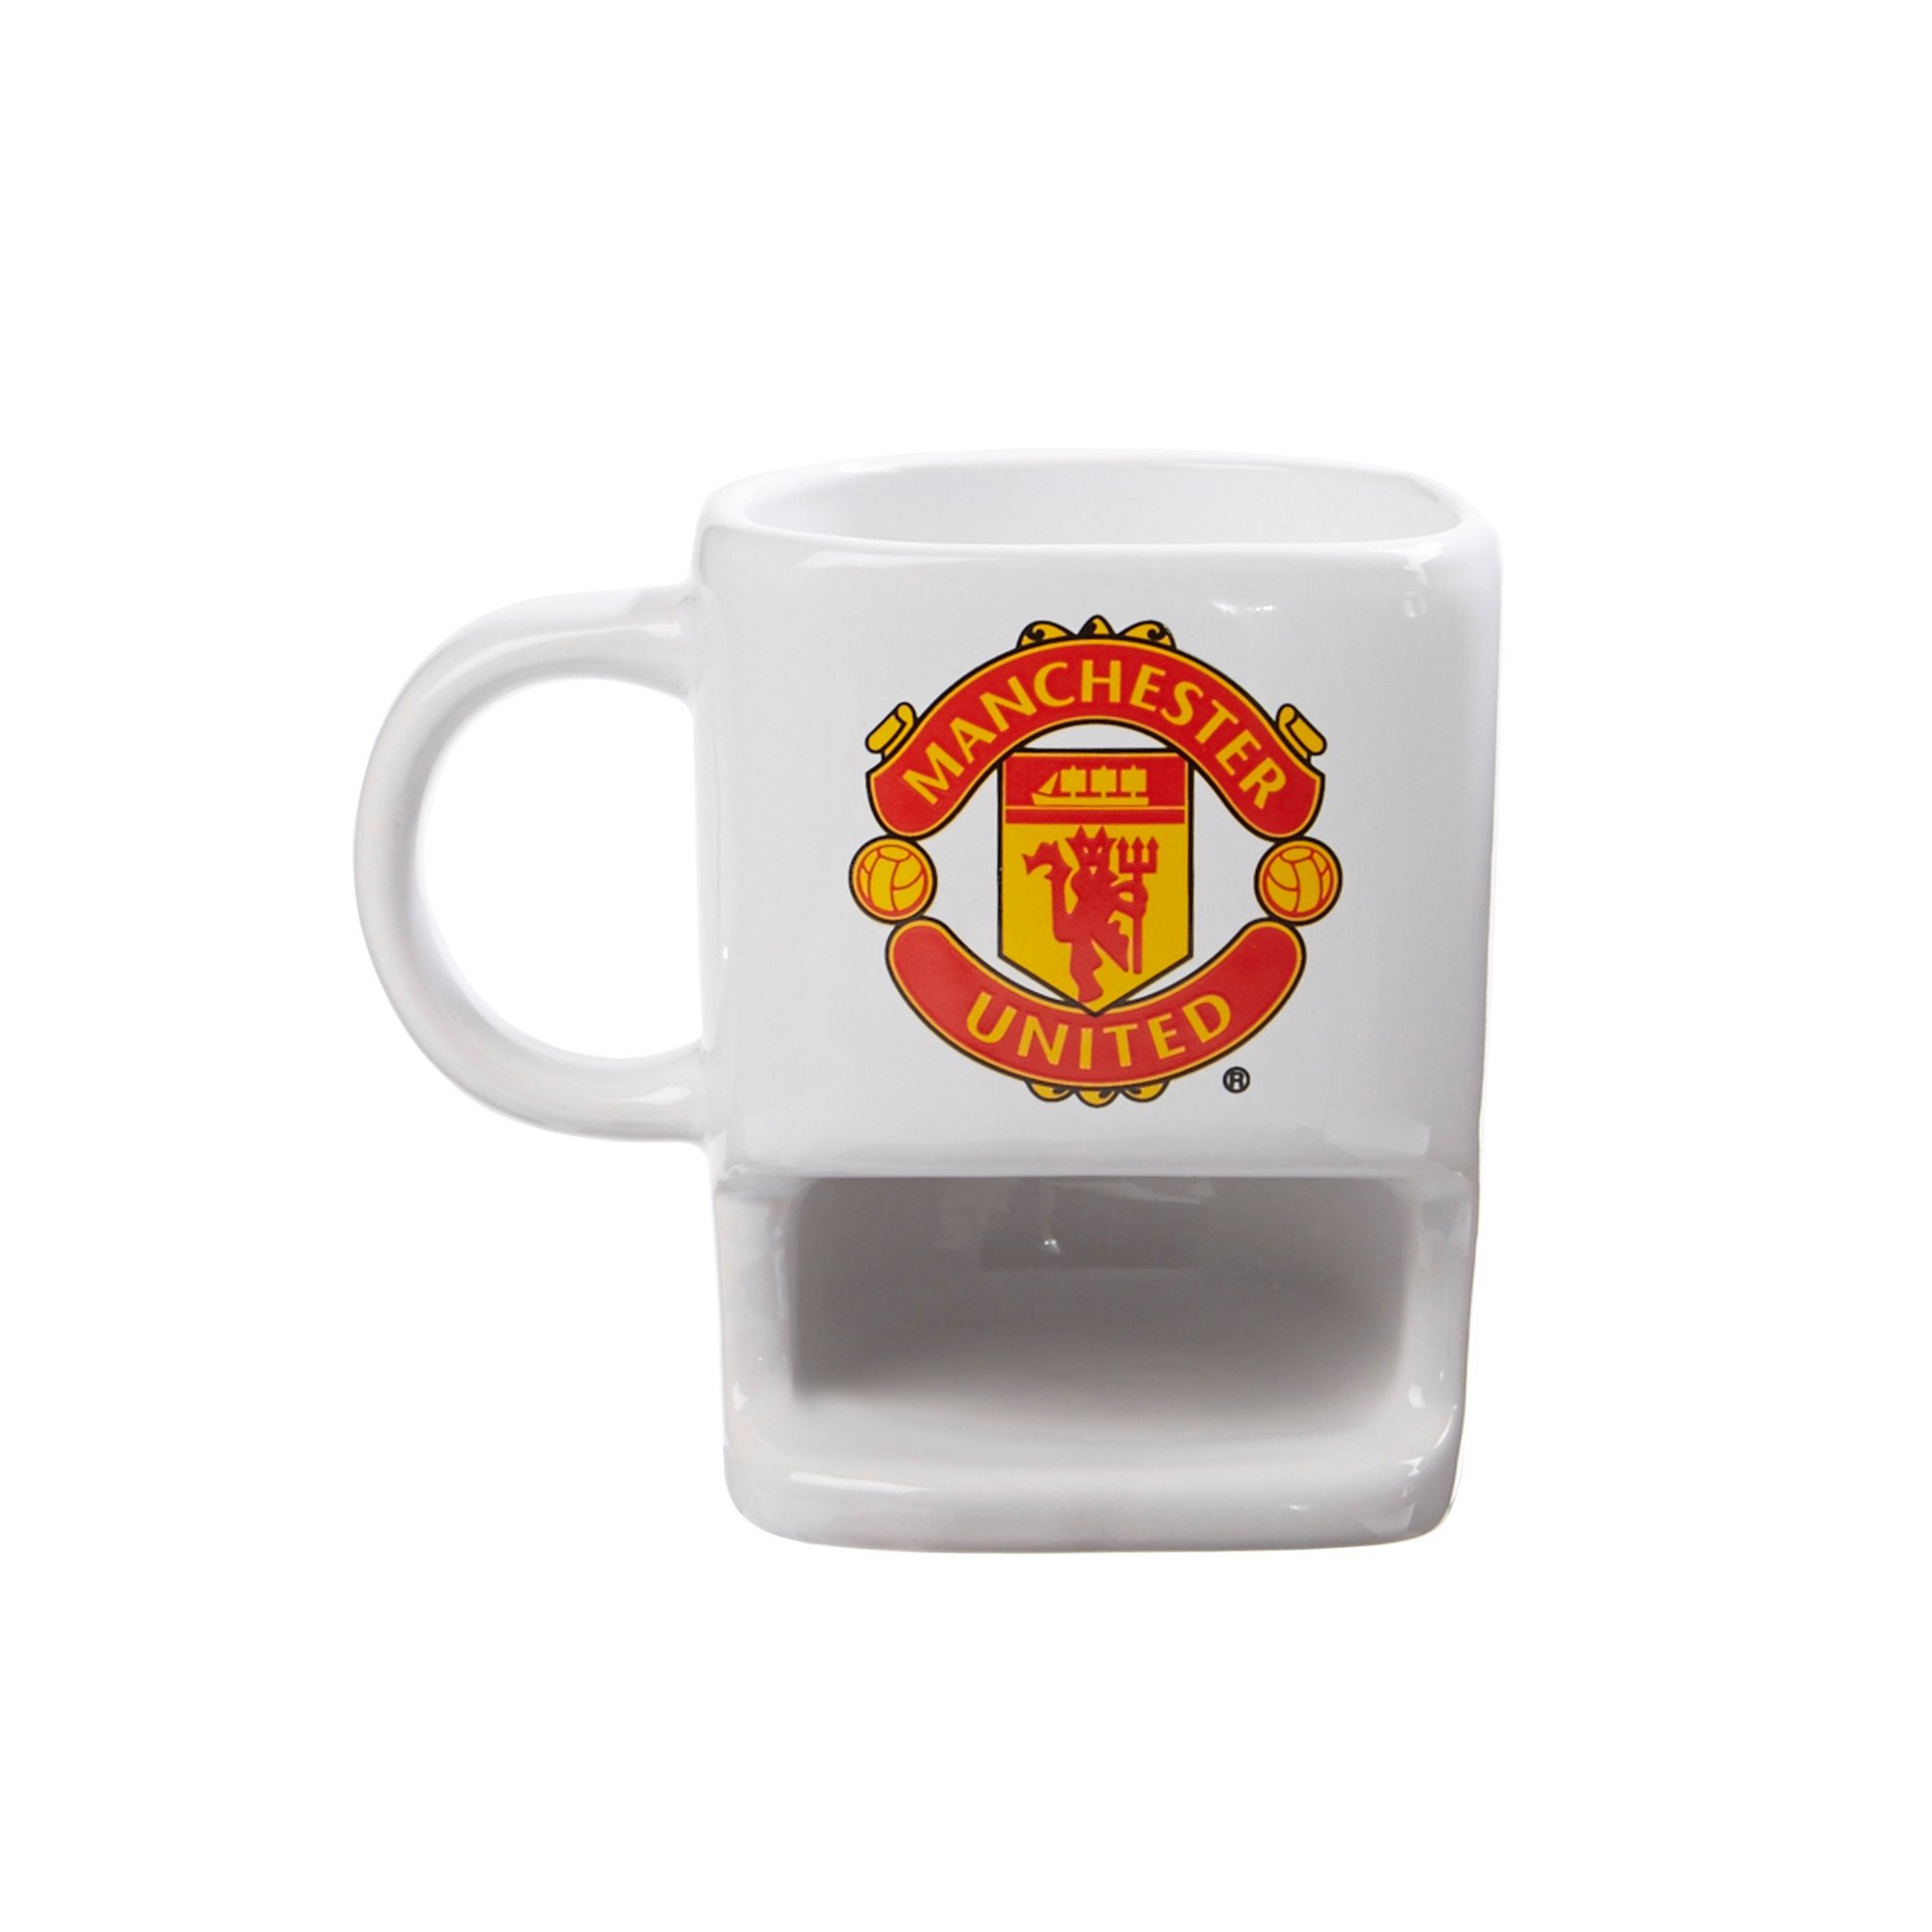 Image of Ceramic Biscuit Mug - Manchester United